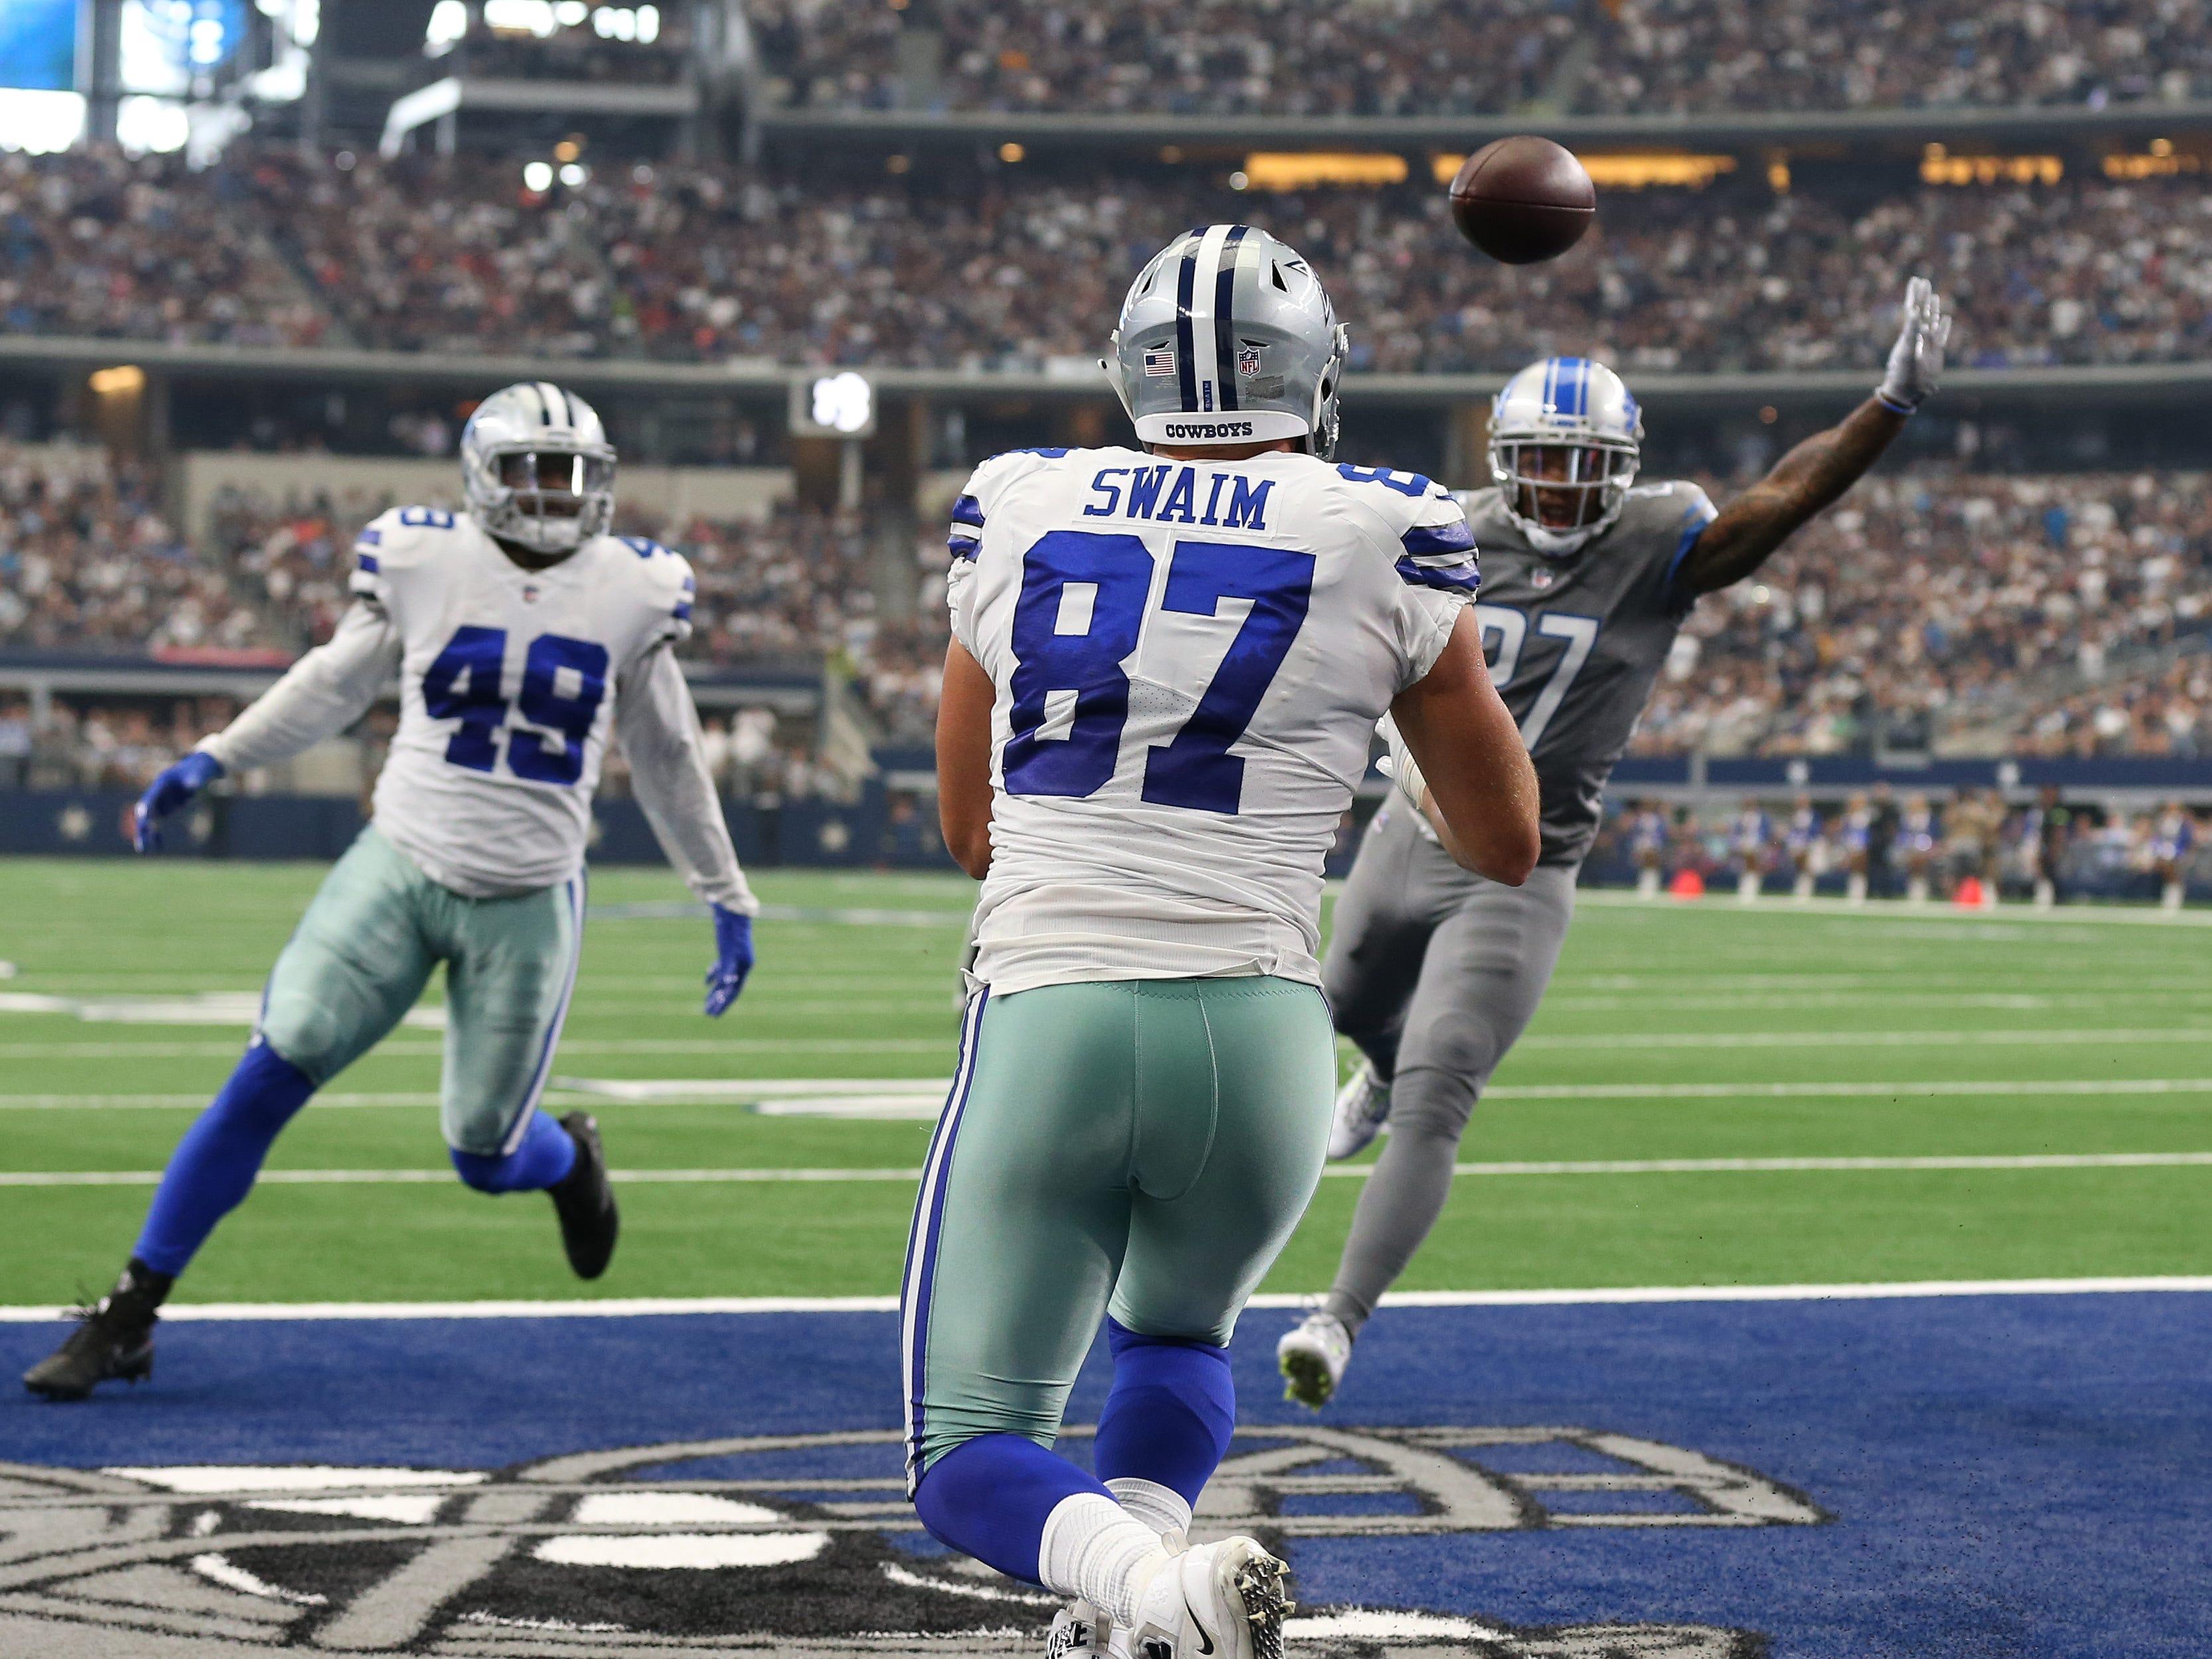 Cowboys tight end Geoff Swaim (87) catches a third quarter touchdown pass against the Lions.